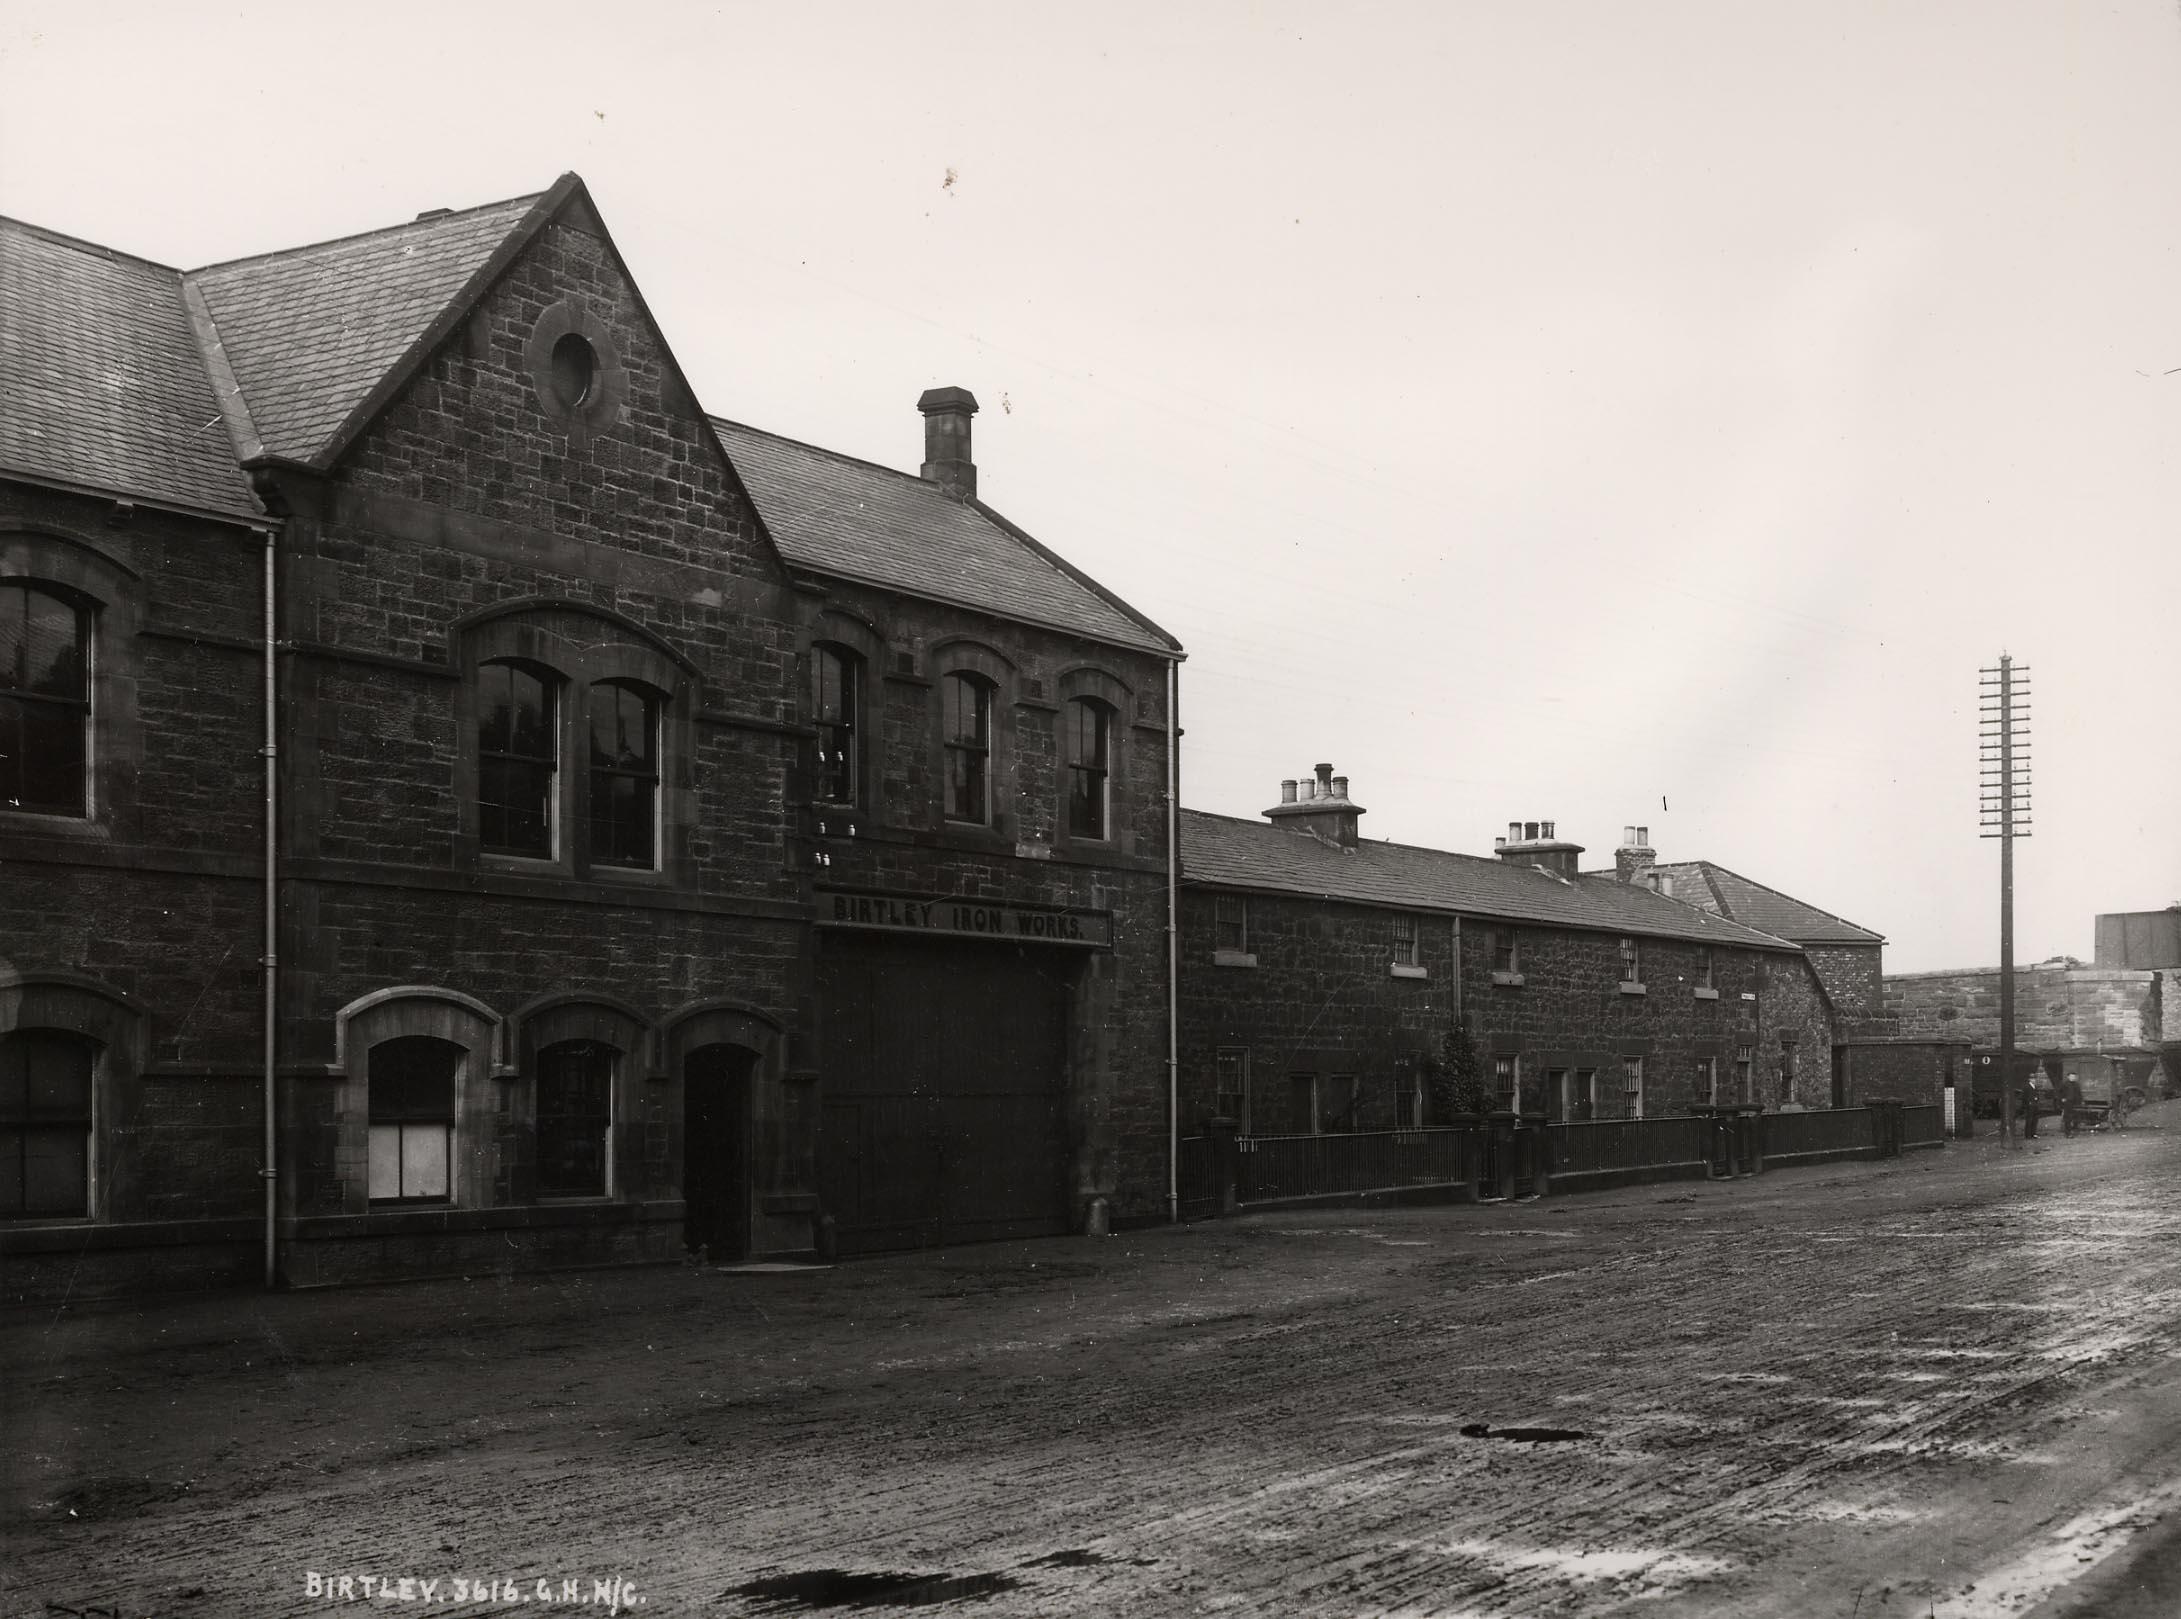 Birtley Iron Company